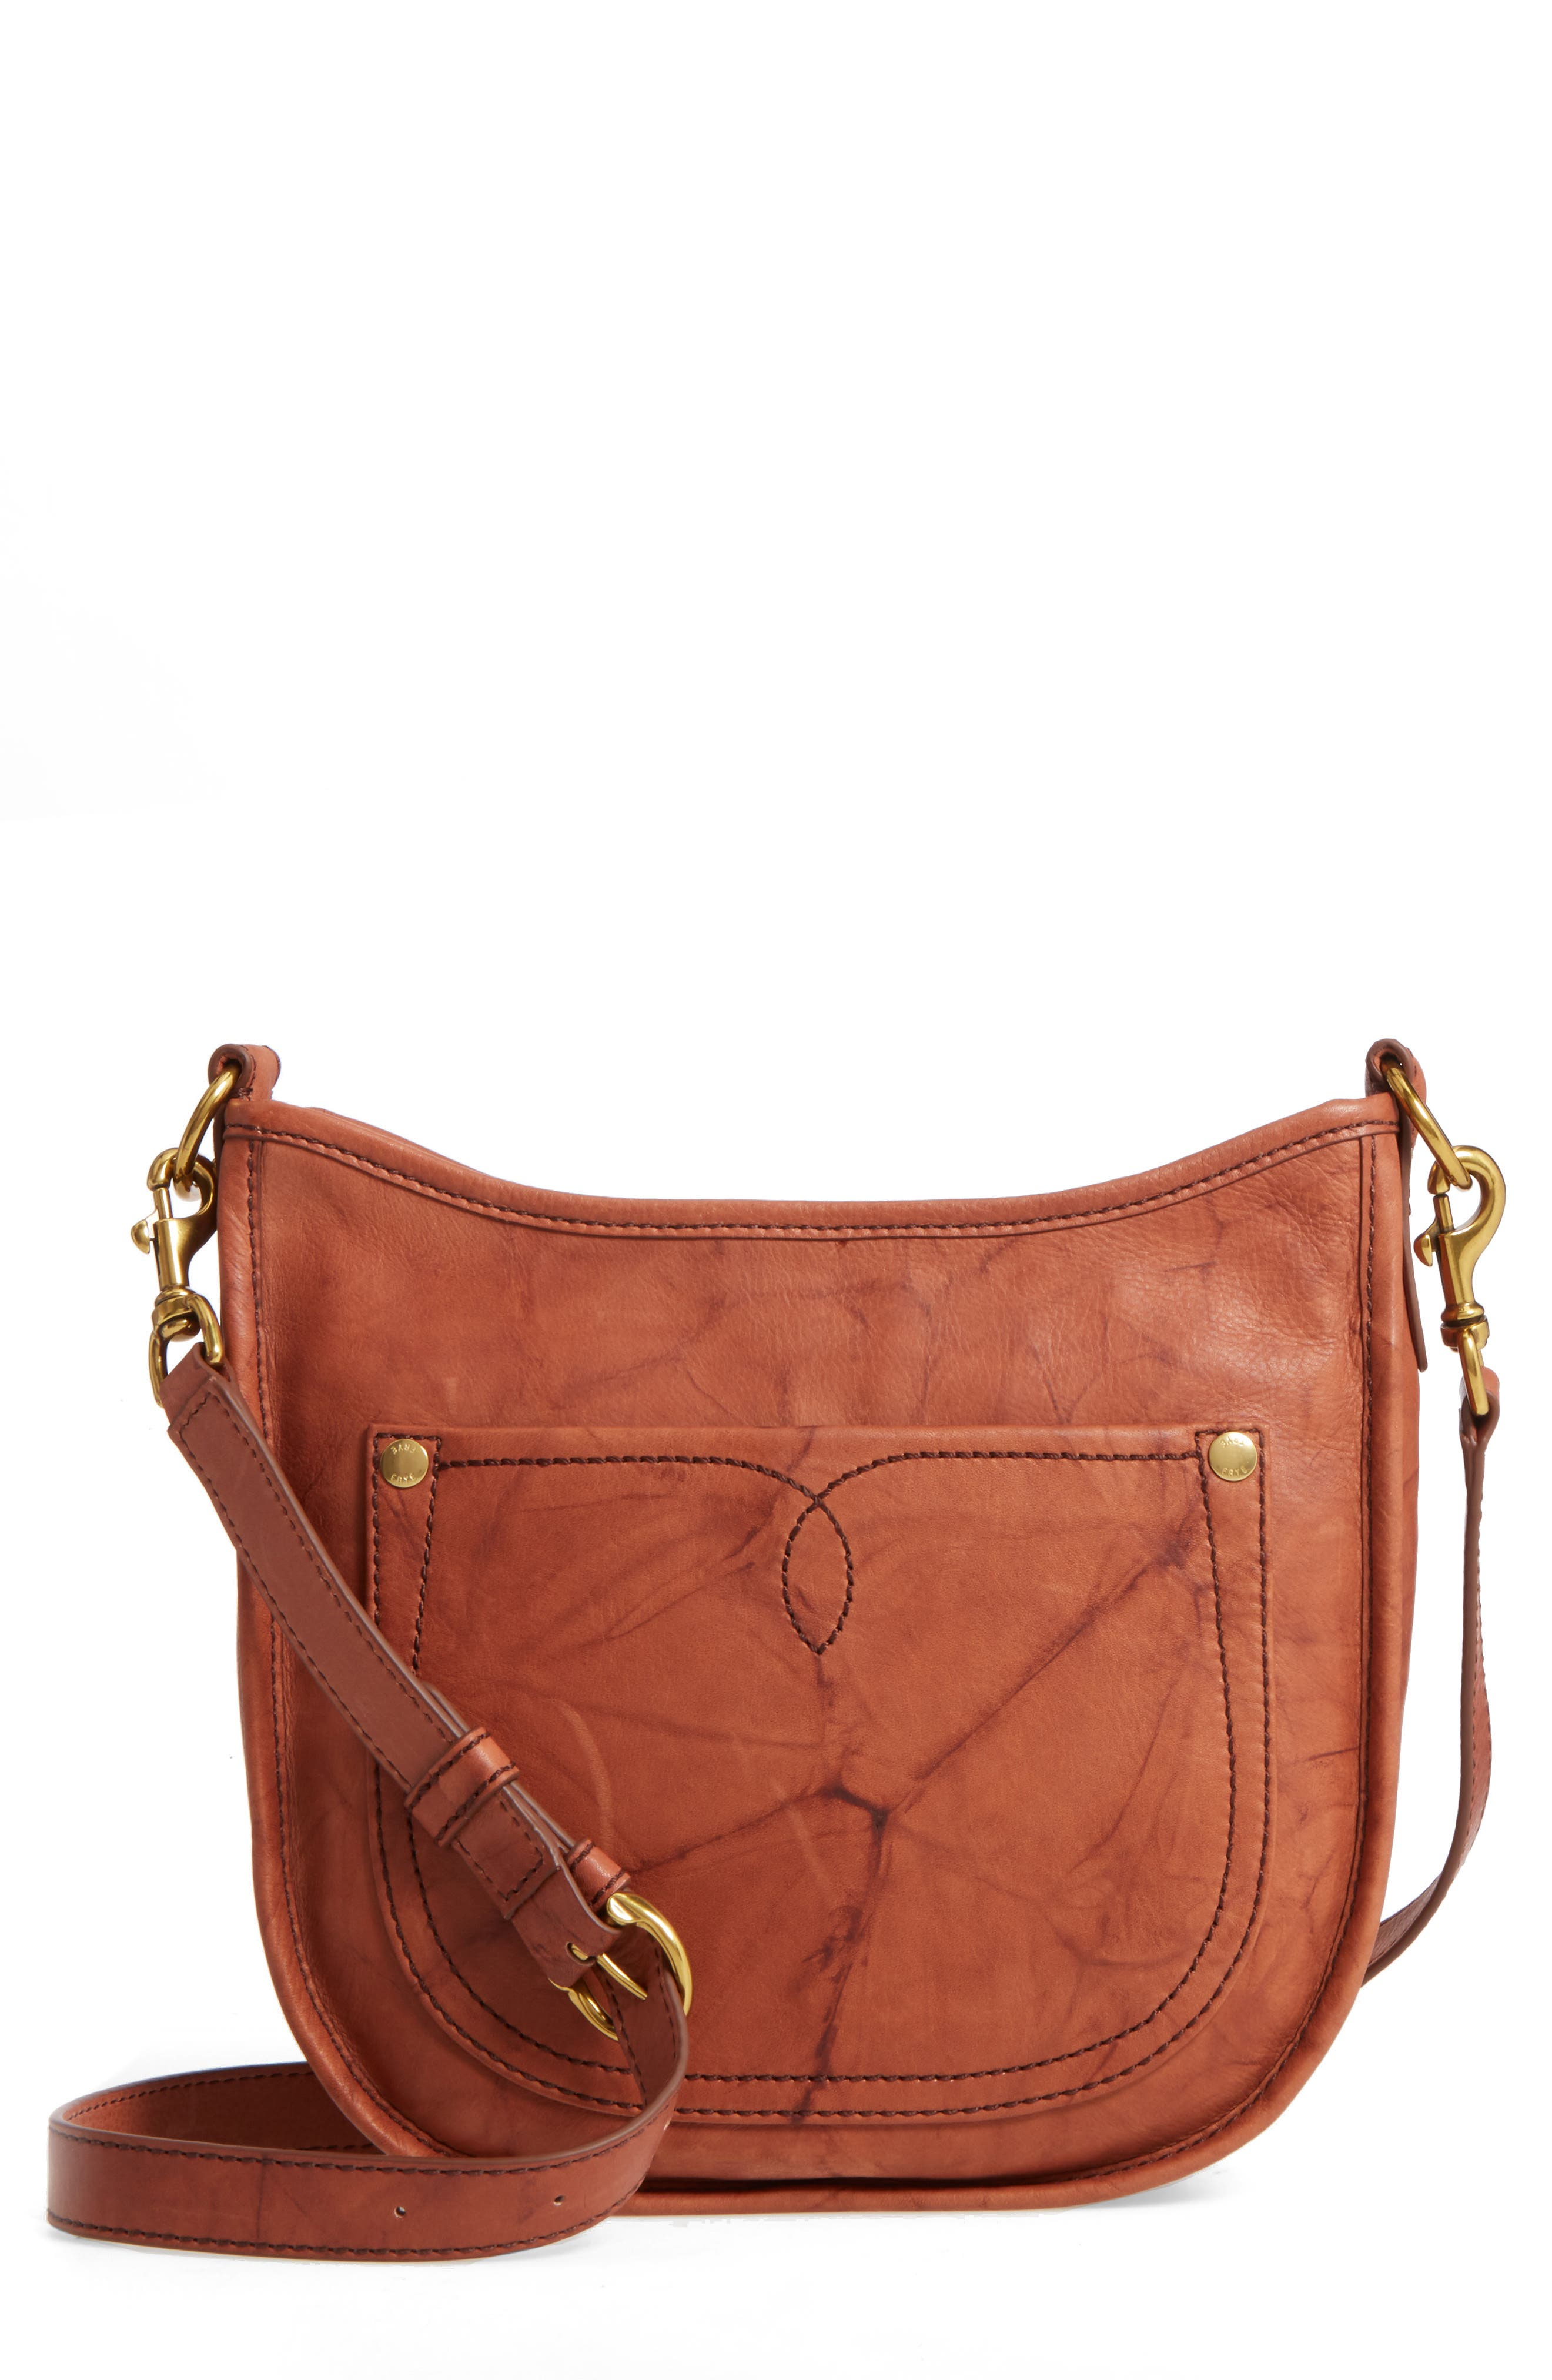 Frye Campus Rivet Leather Crossbody Bag